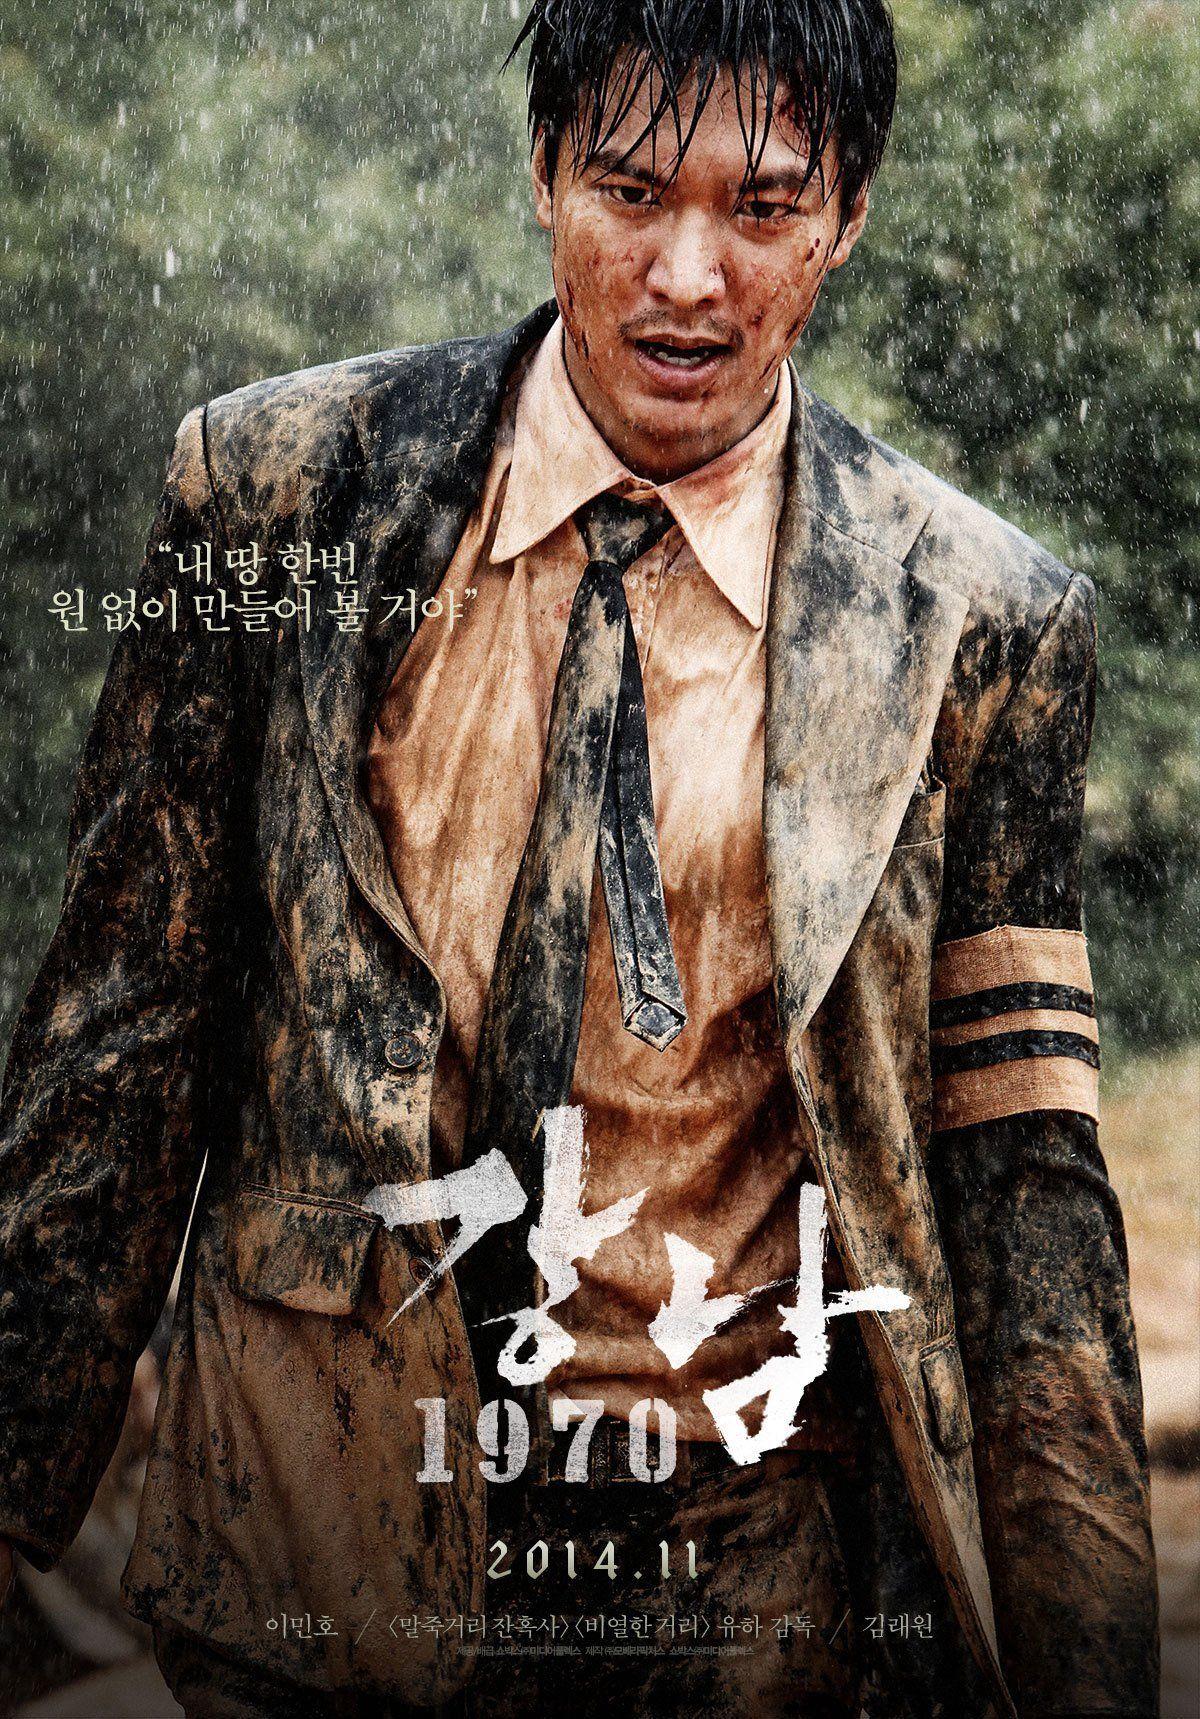 Watch Gangnam Blues Movie English Sub Hot Http Www Dramaboss Com Gangnam Blues Movie Lee Min Ho Movies Lee Min Ho Photos Lee Min